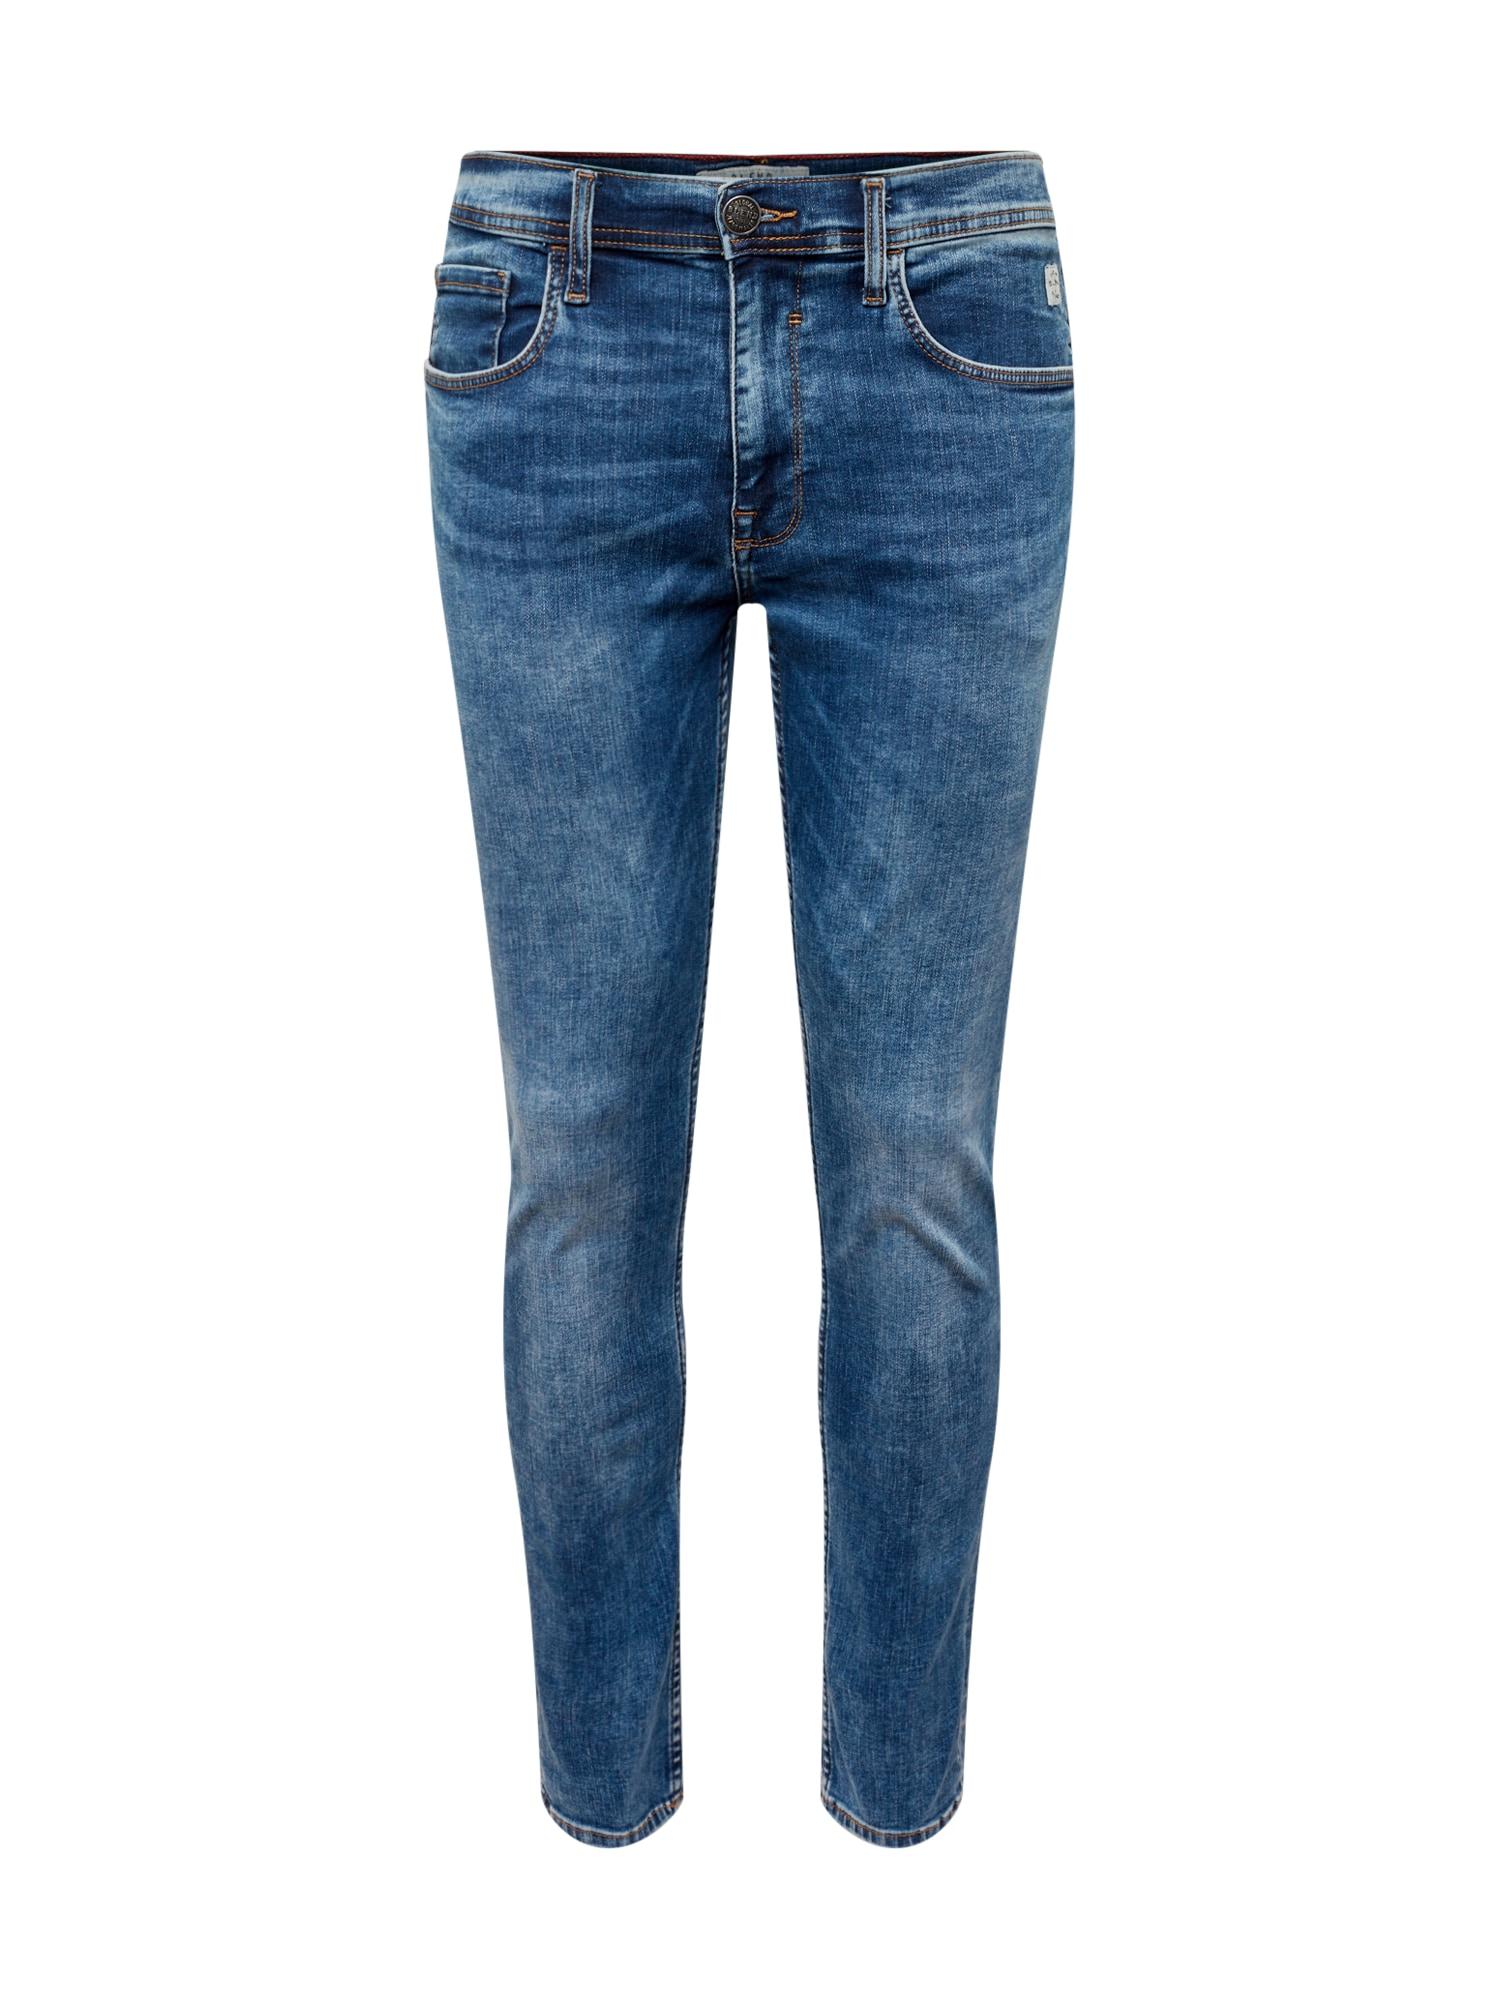 BLEND Džinsai 'Jet Slim Taperd Multiflex' tamsiai (džinso) mėlyna